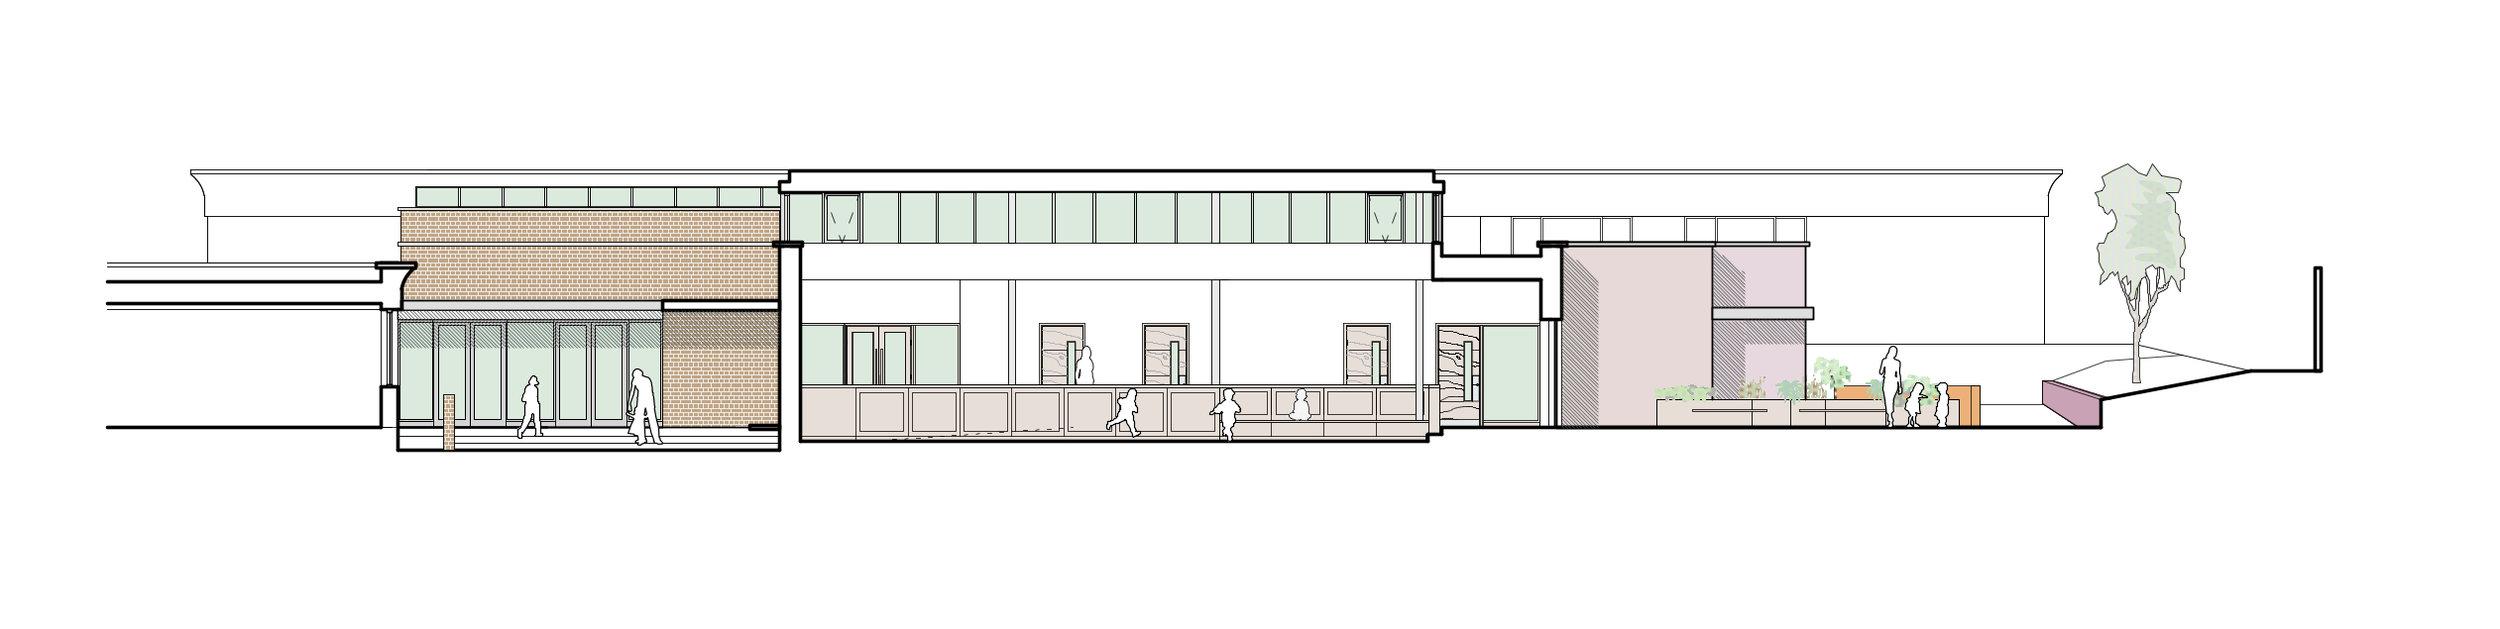 Cross section through entrance courtyard, central activities space and sensory garden.